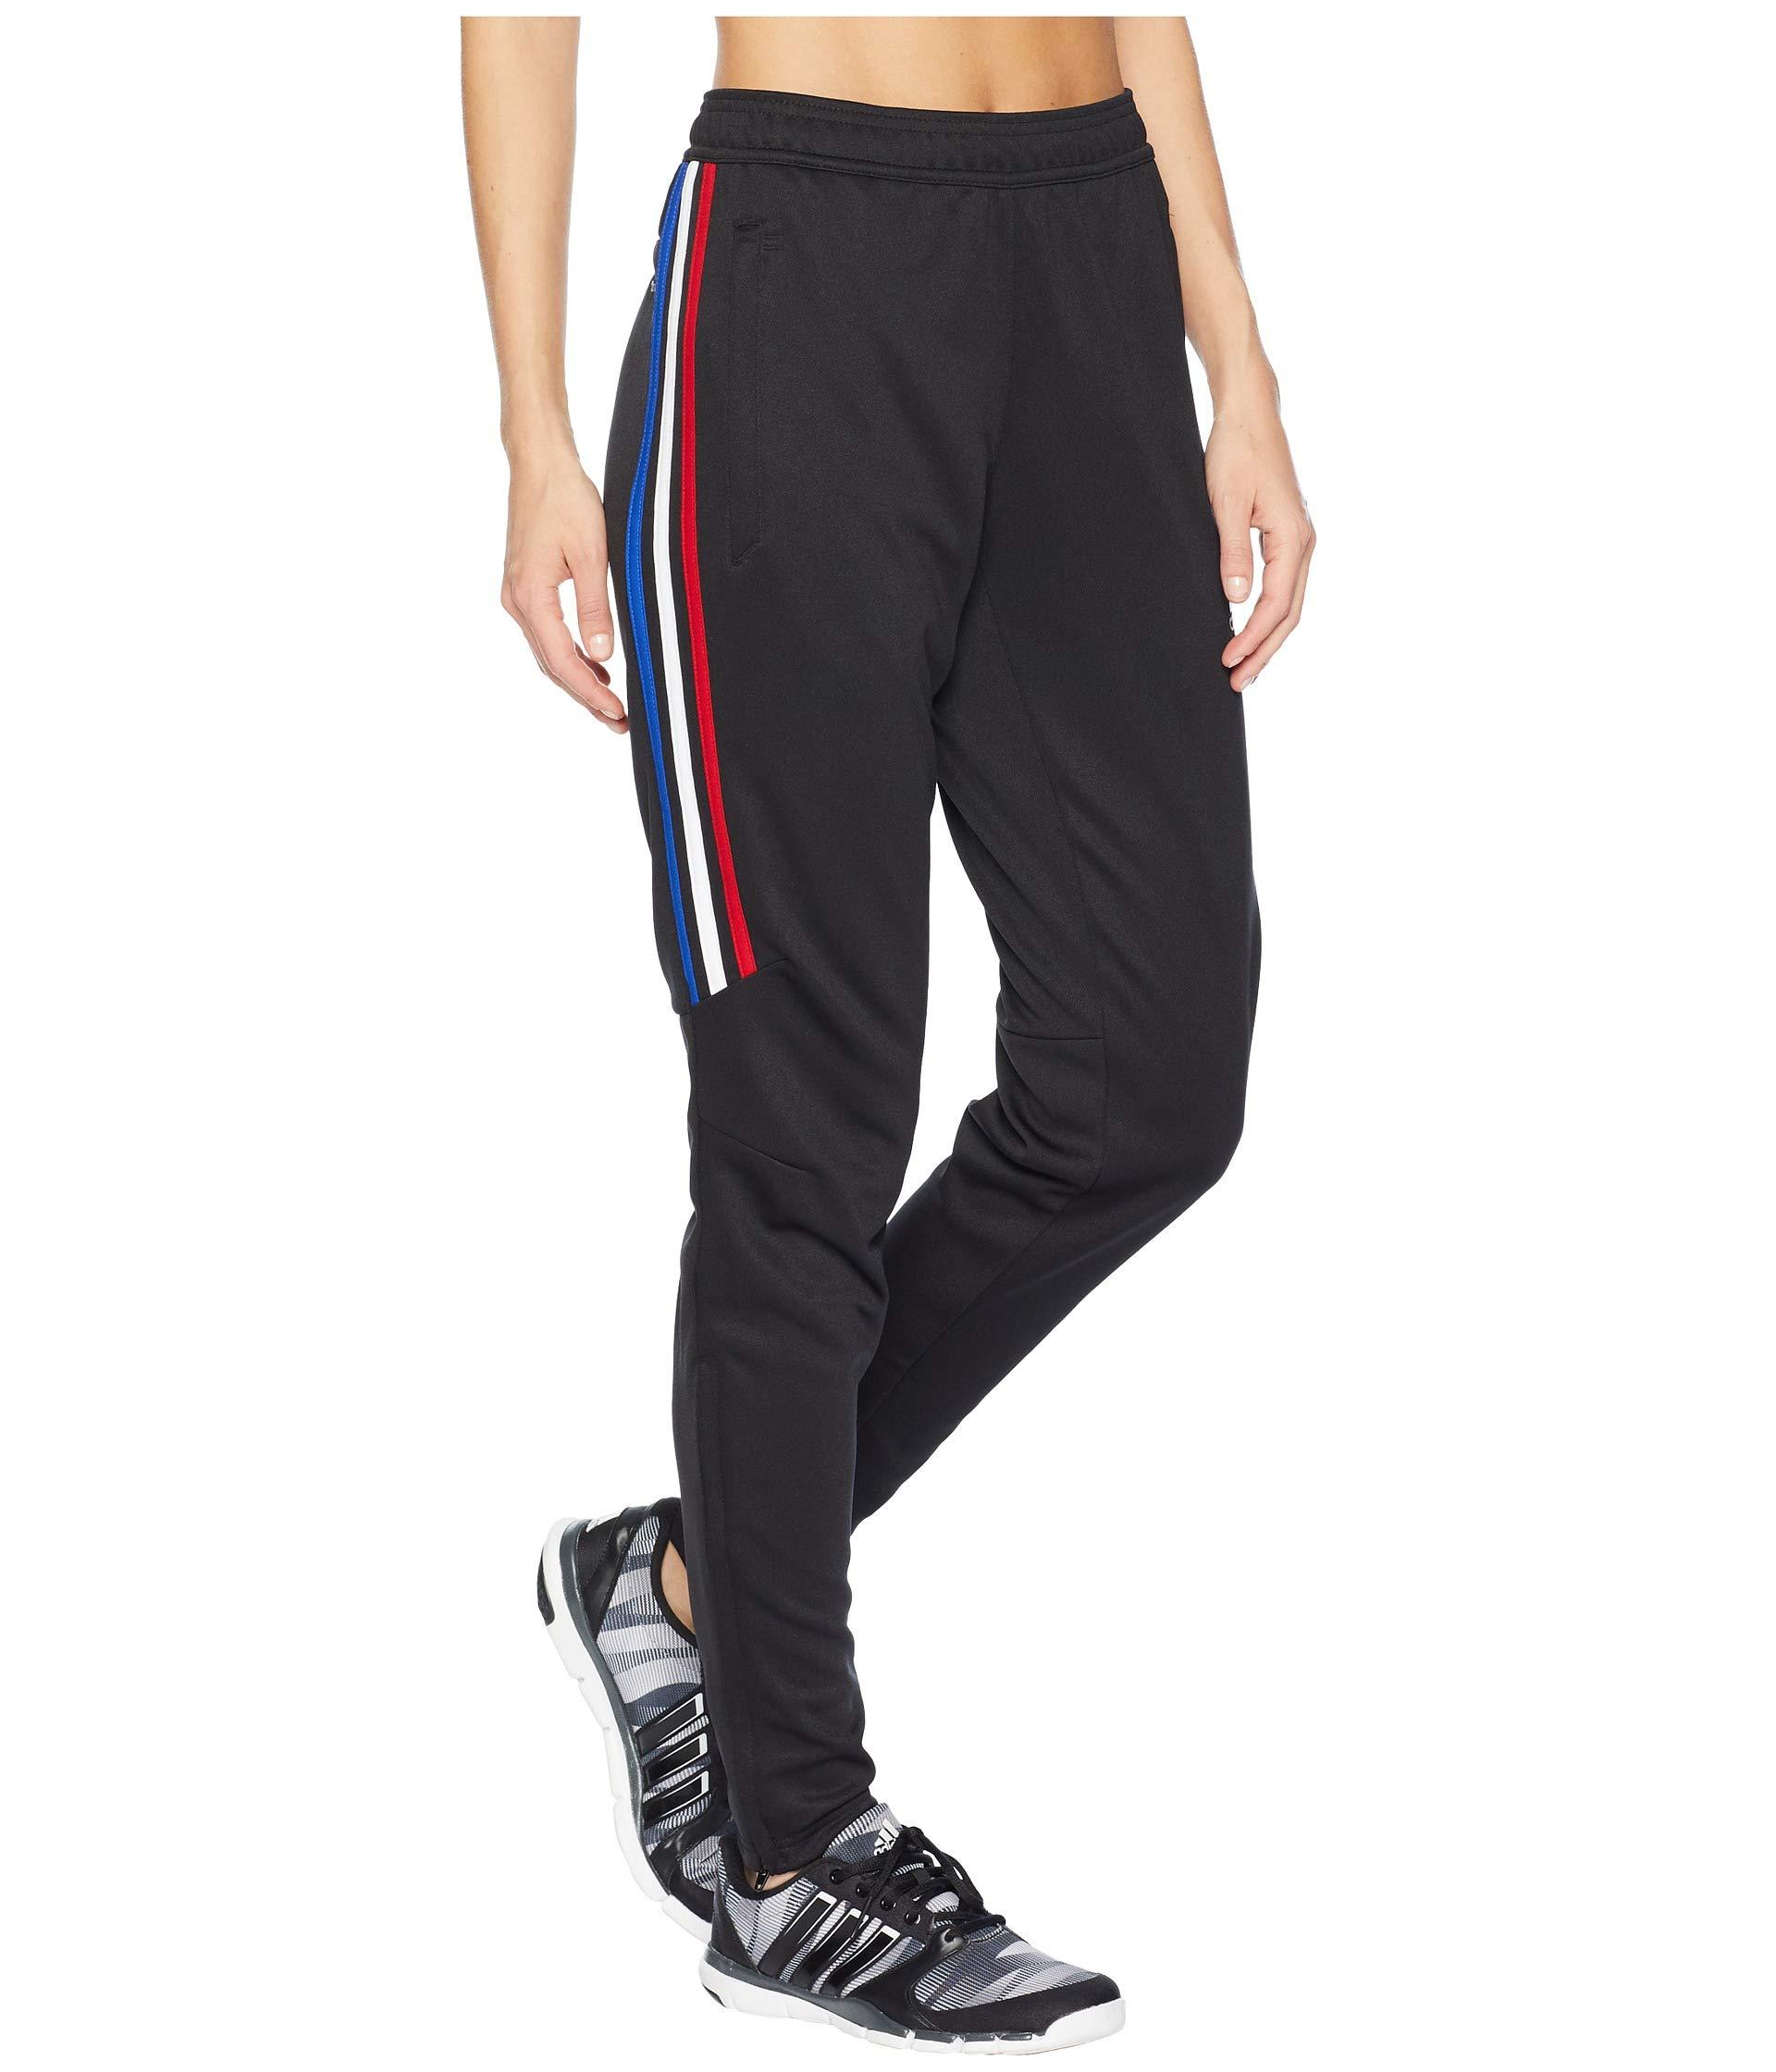 adidas Tiro '17 Pants Black/Power Red/White/Bold Blue 2XL by adidas